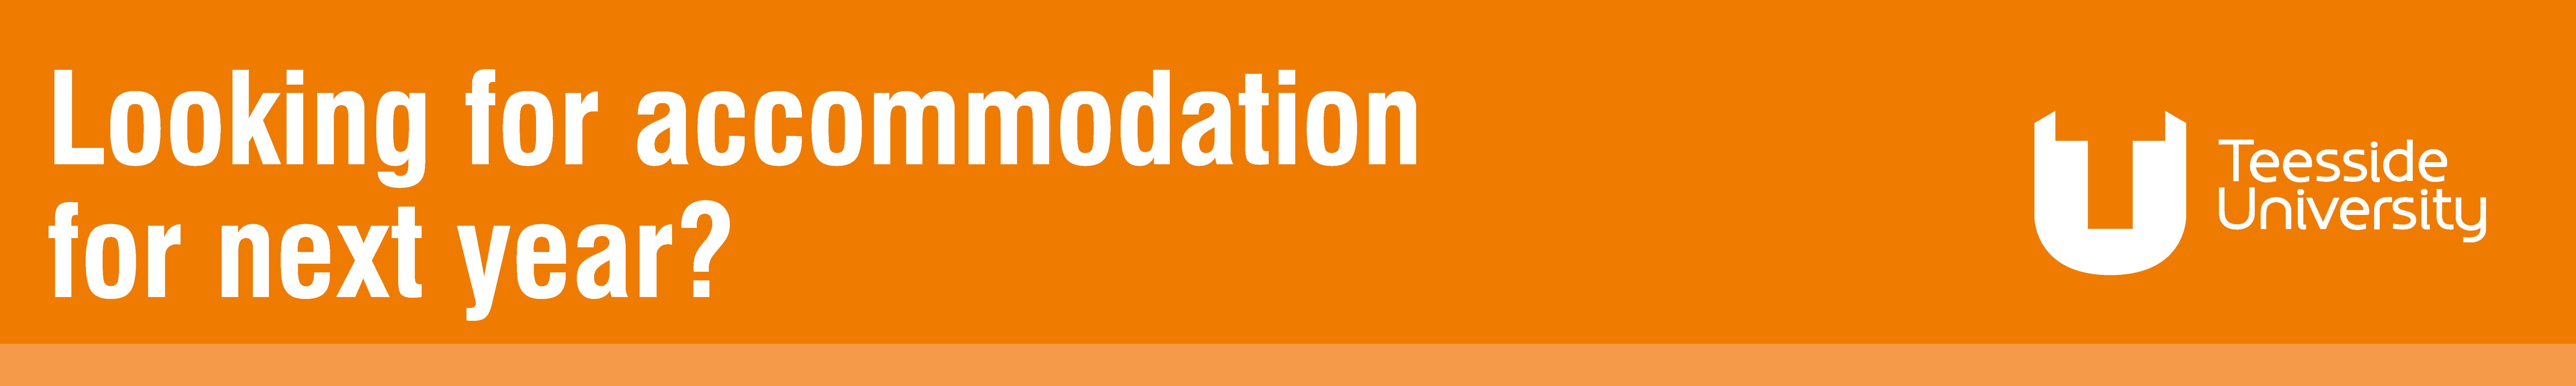 Tu accommodation web banner 2021 3